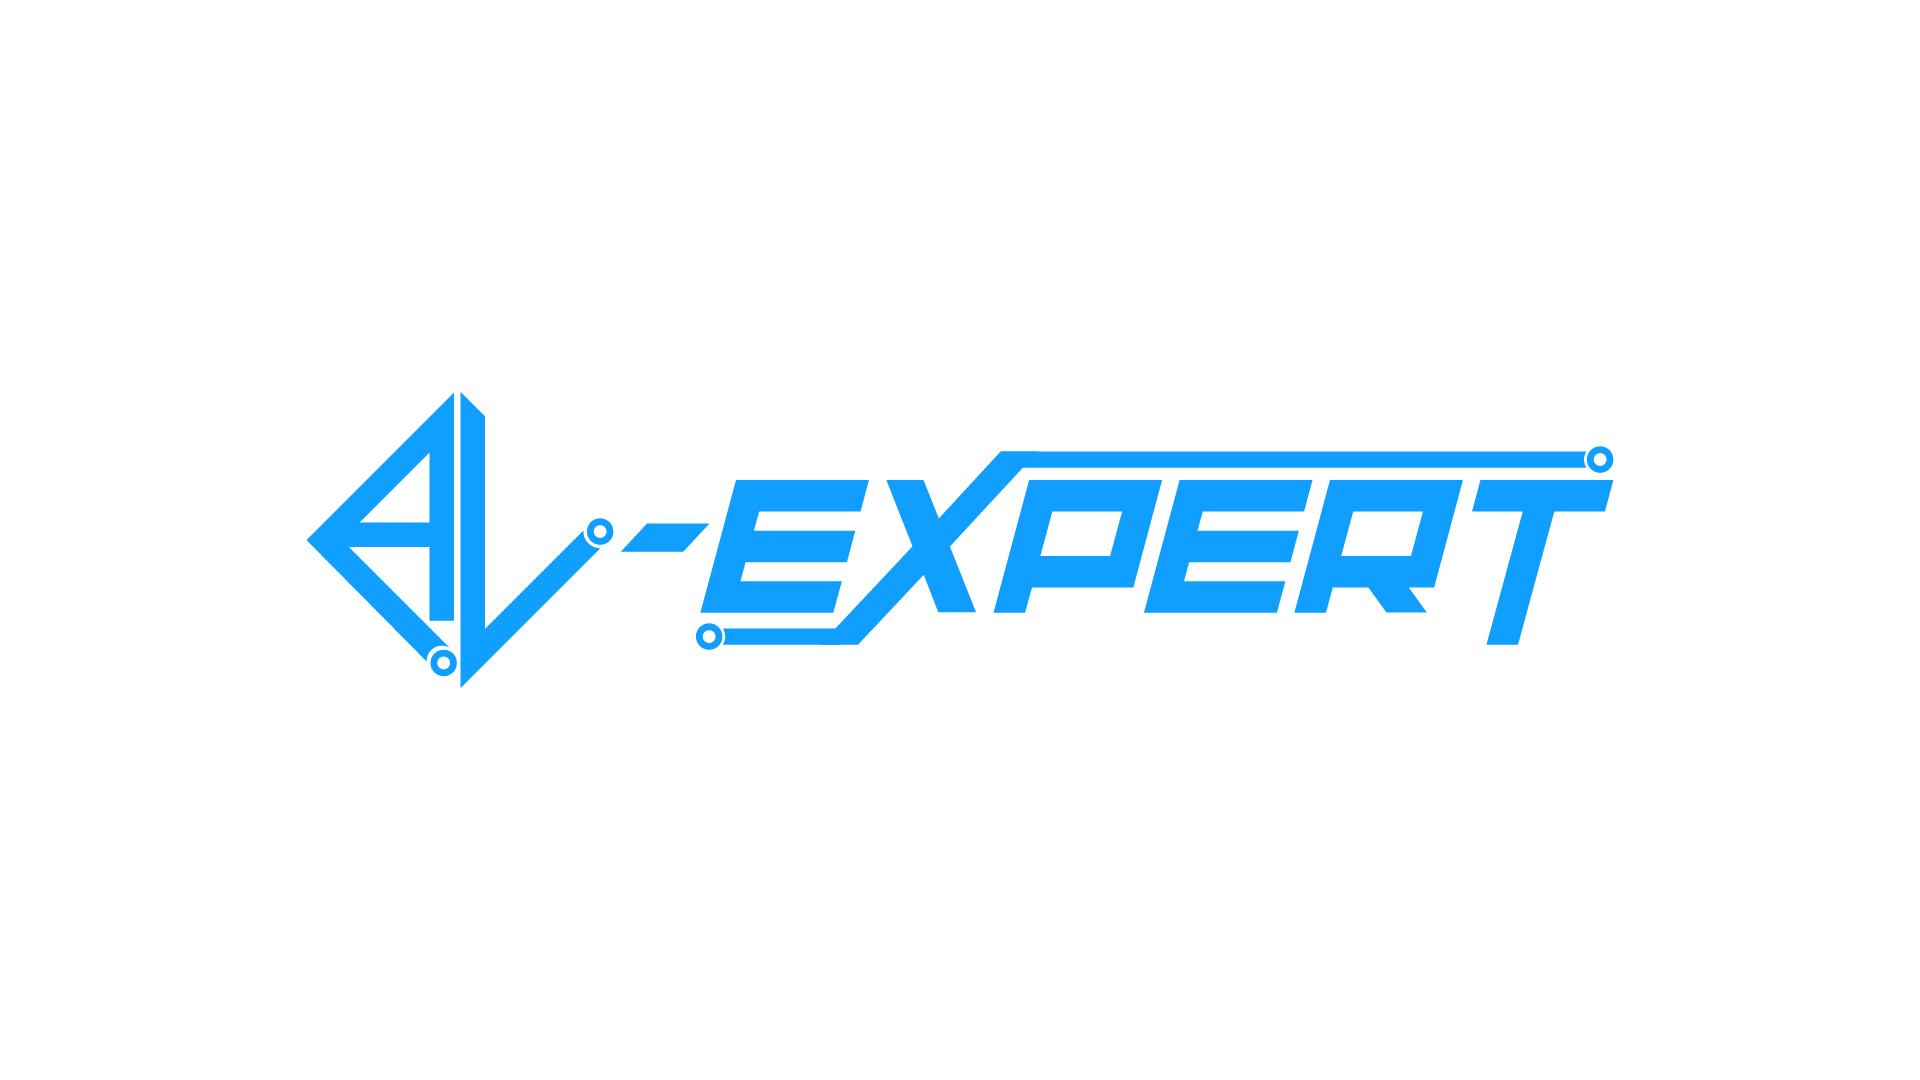 Создание логотипа, фирстиля фото f_0675c63dbf500634.jpg